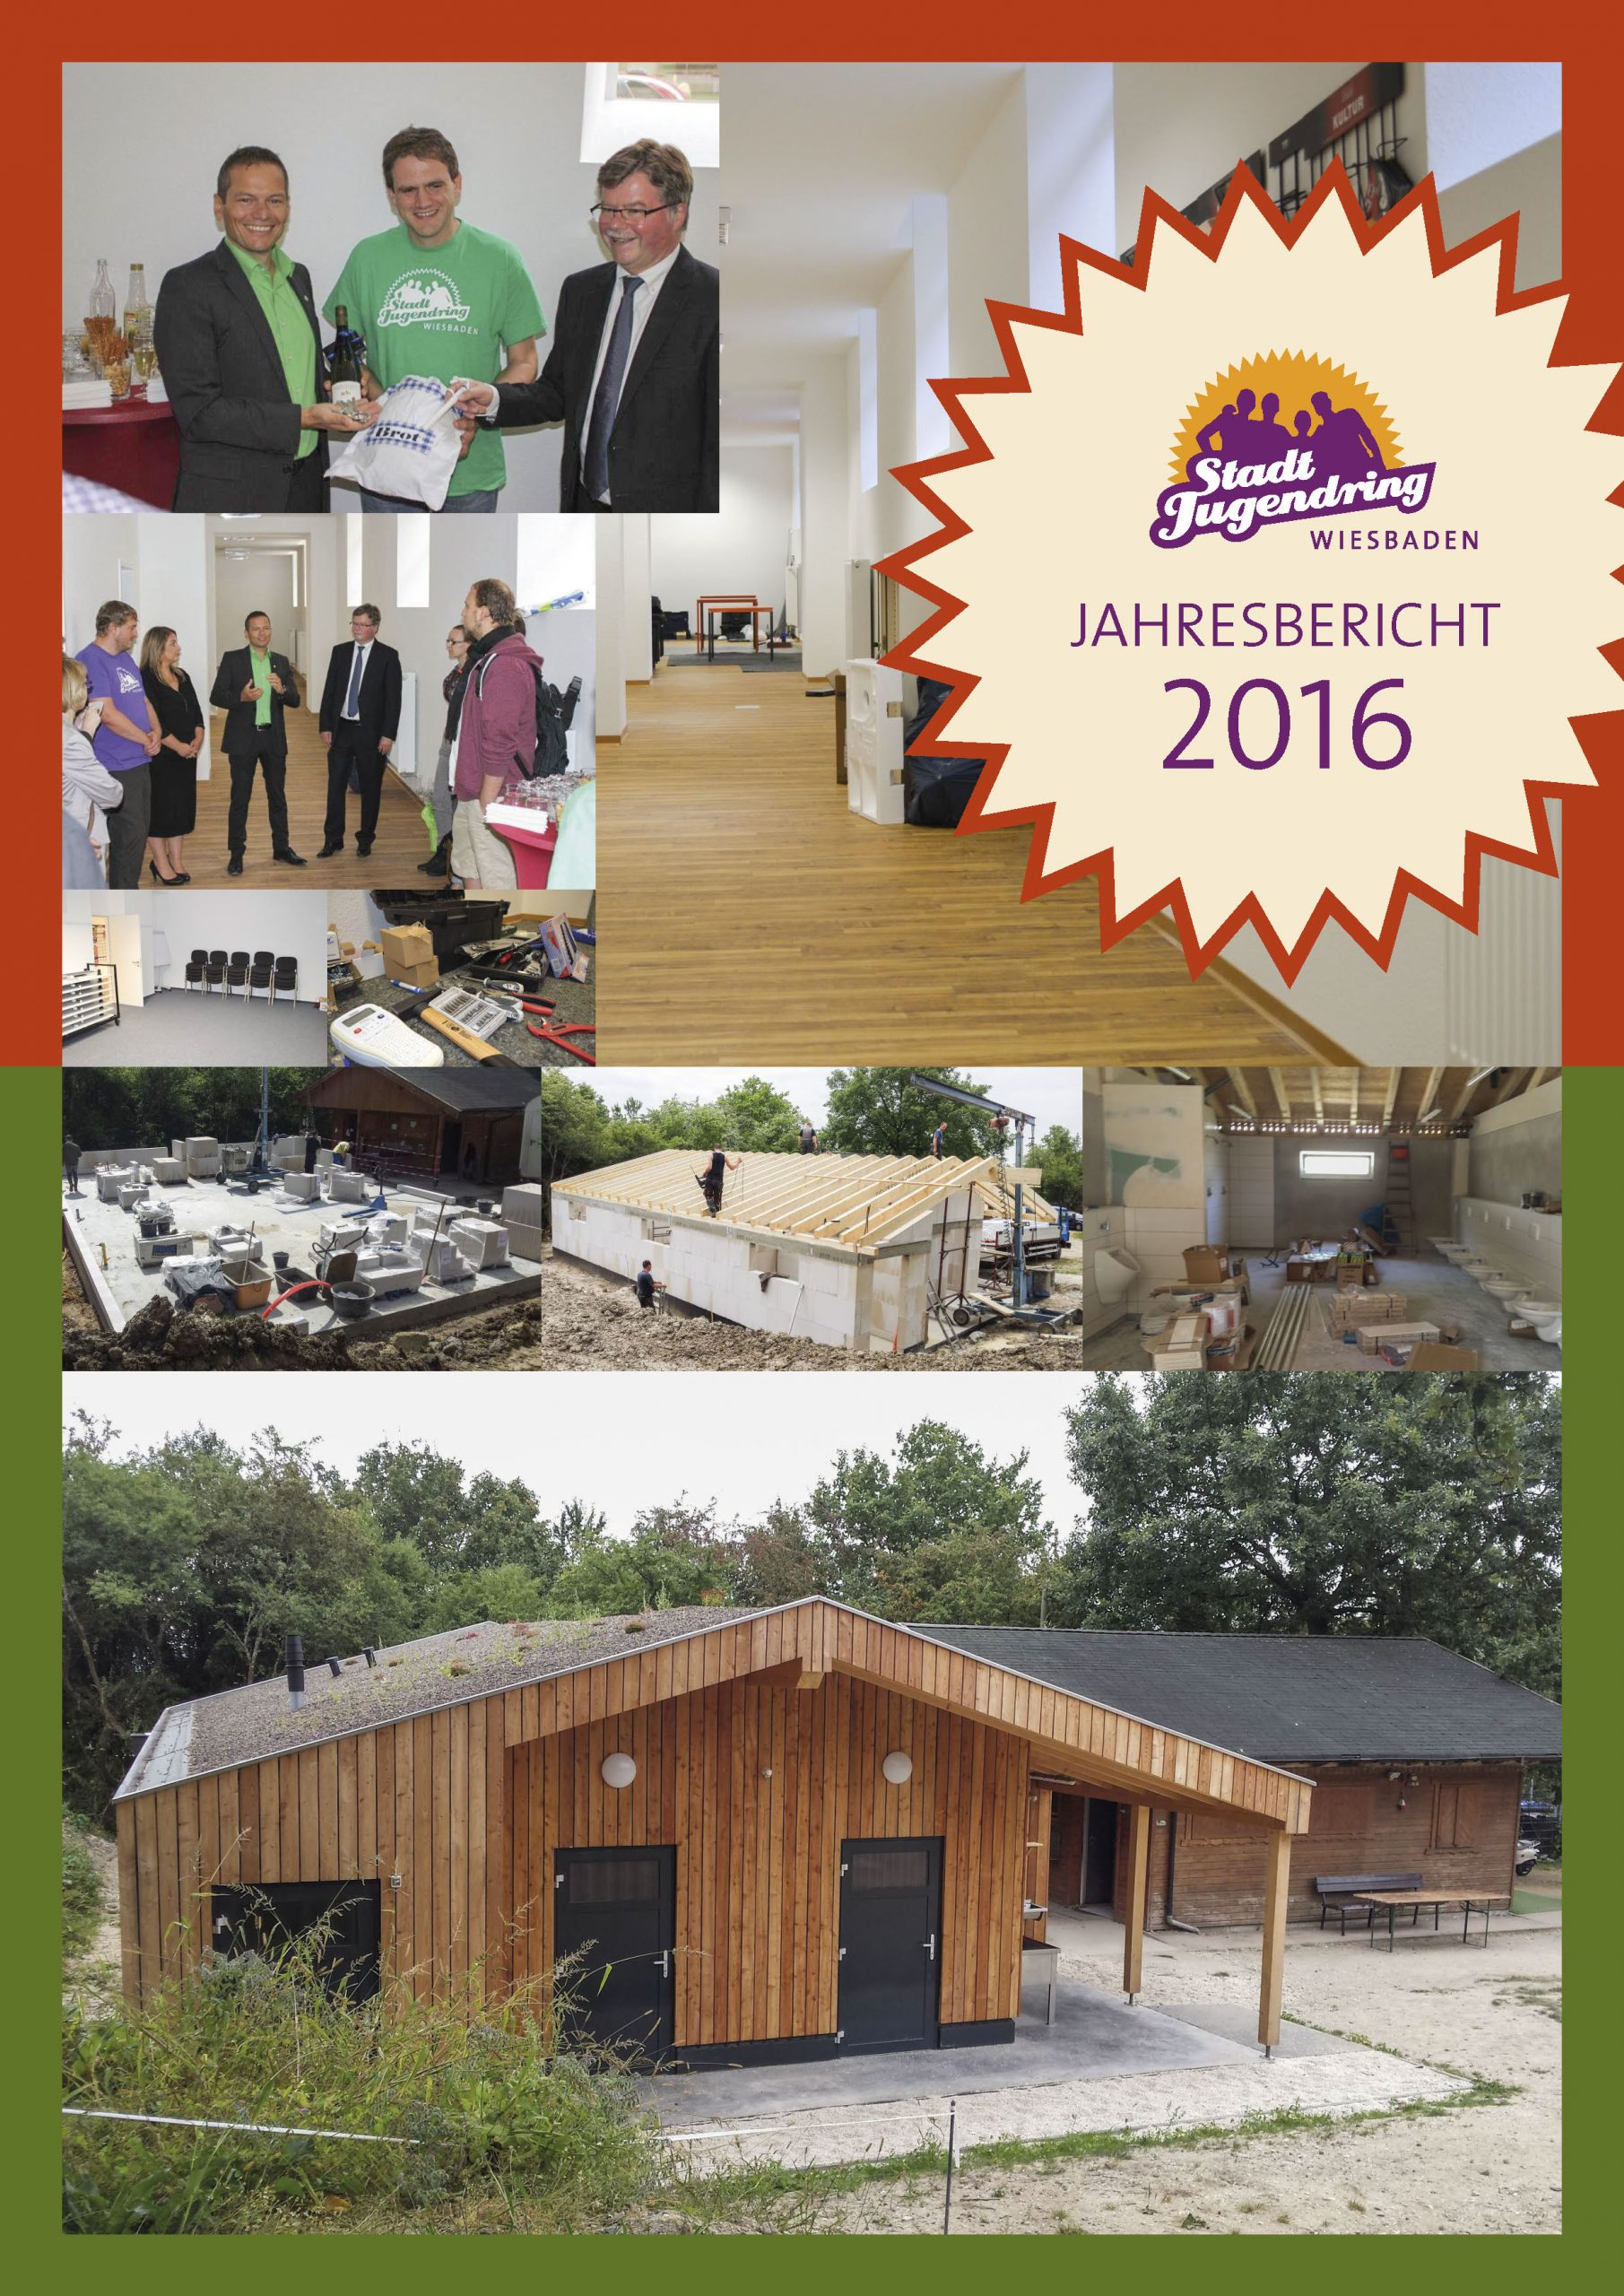 SJR Jahresbericht 2016